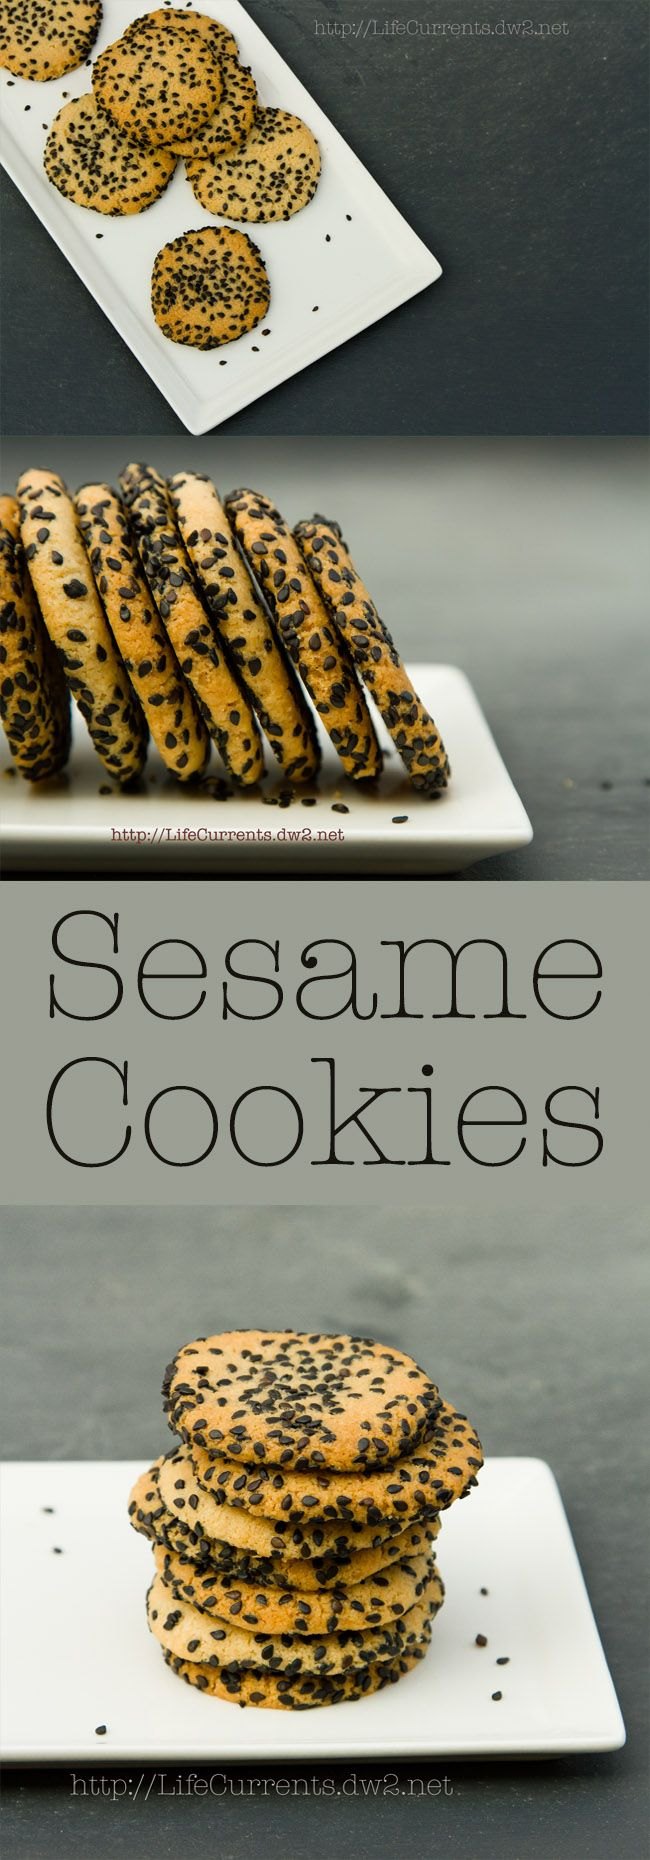 Sesame Cookies - Life Currents